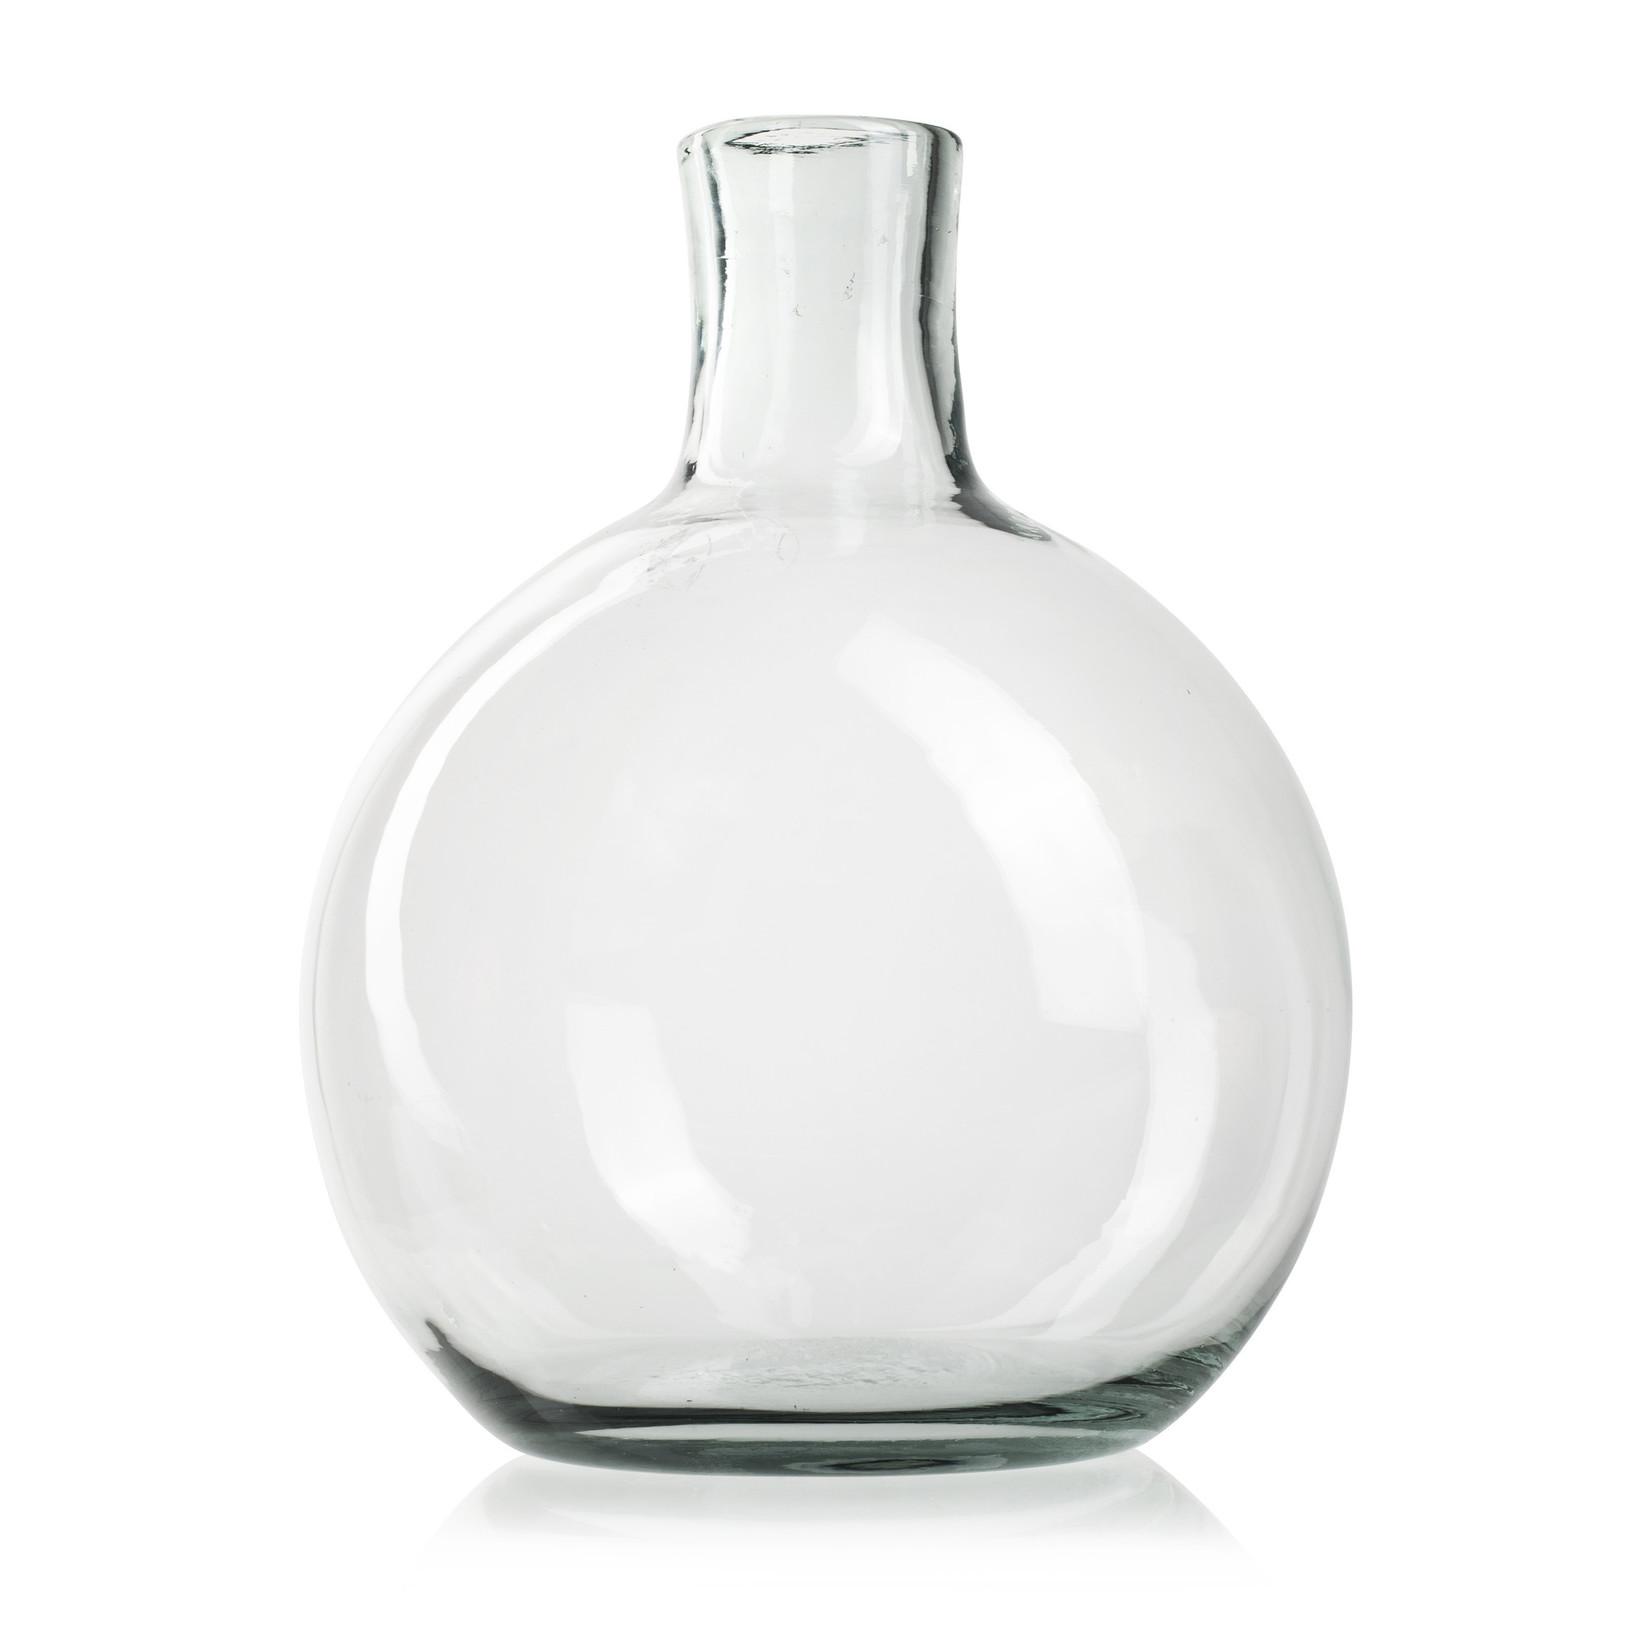 Jodeco Glass Eco vaas 'Ezra'